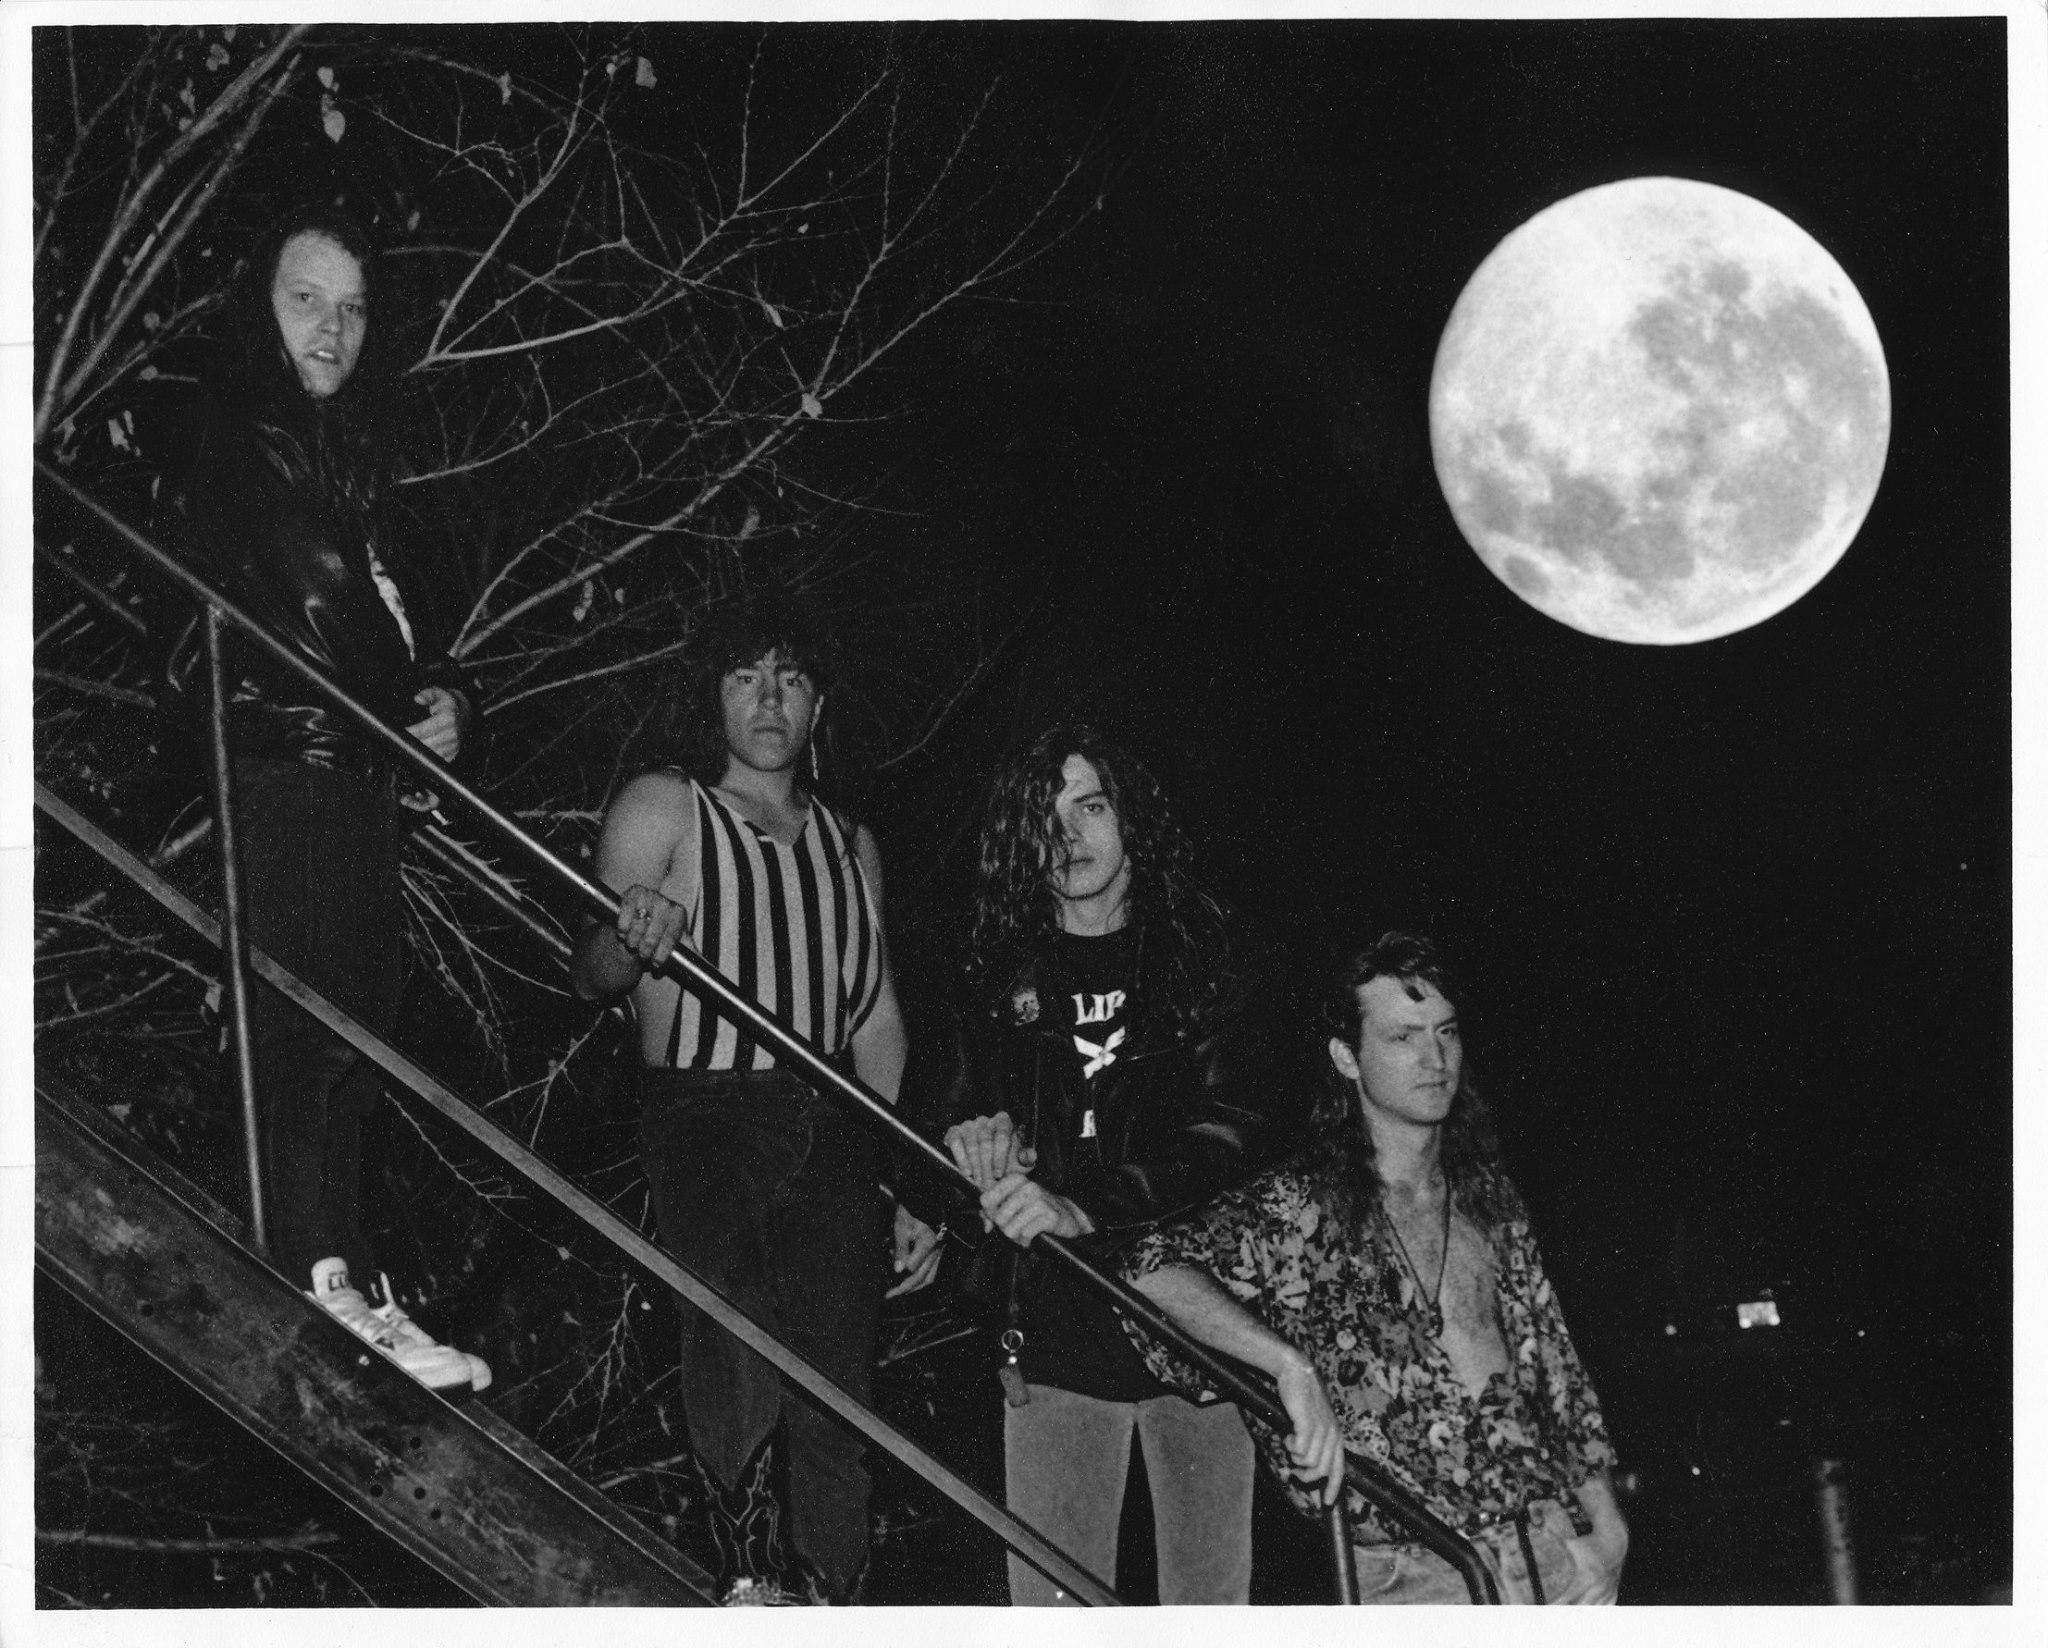 MetalSeminarPhotoByMarkFullerton02_1993